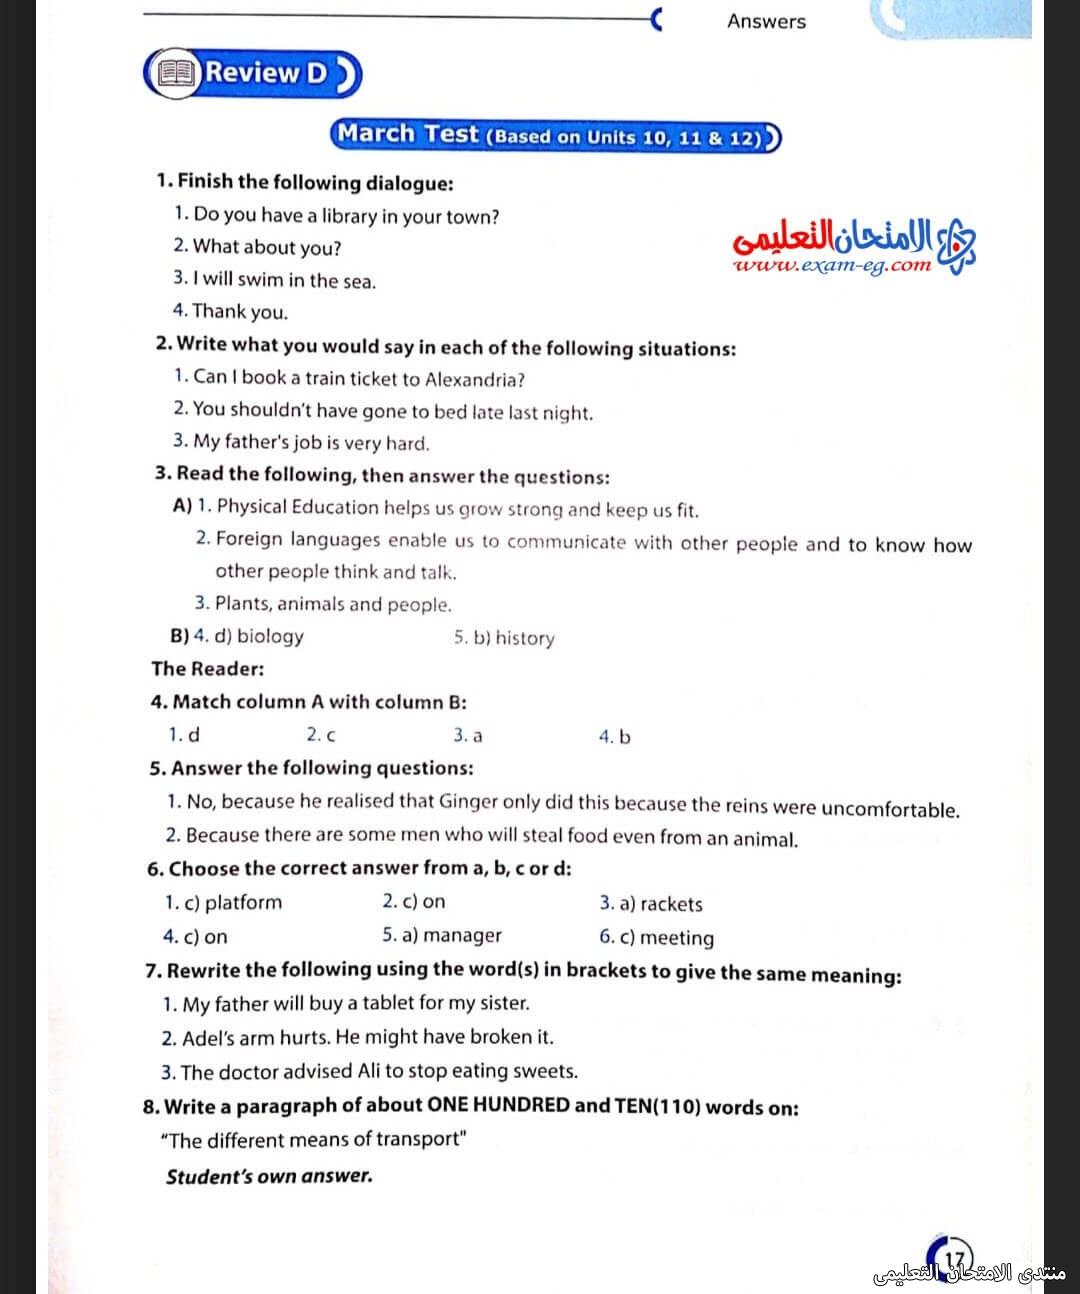 exam-eg.com_1622362060295610.jpg